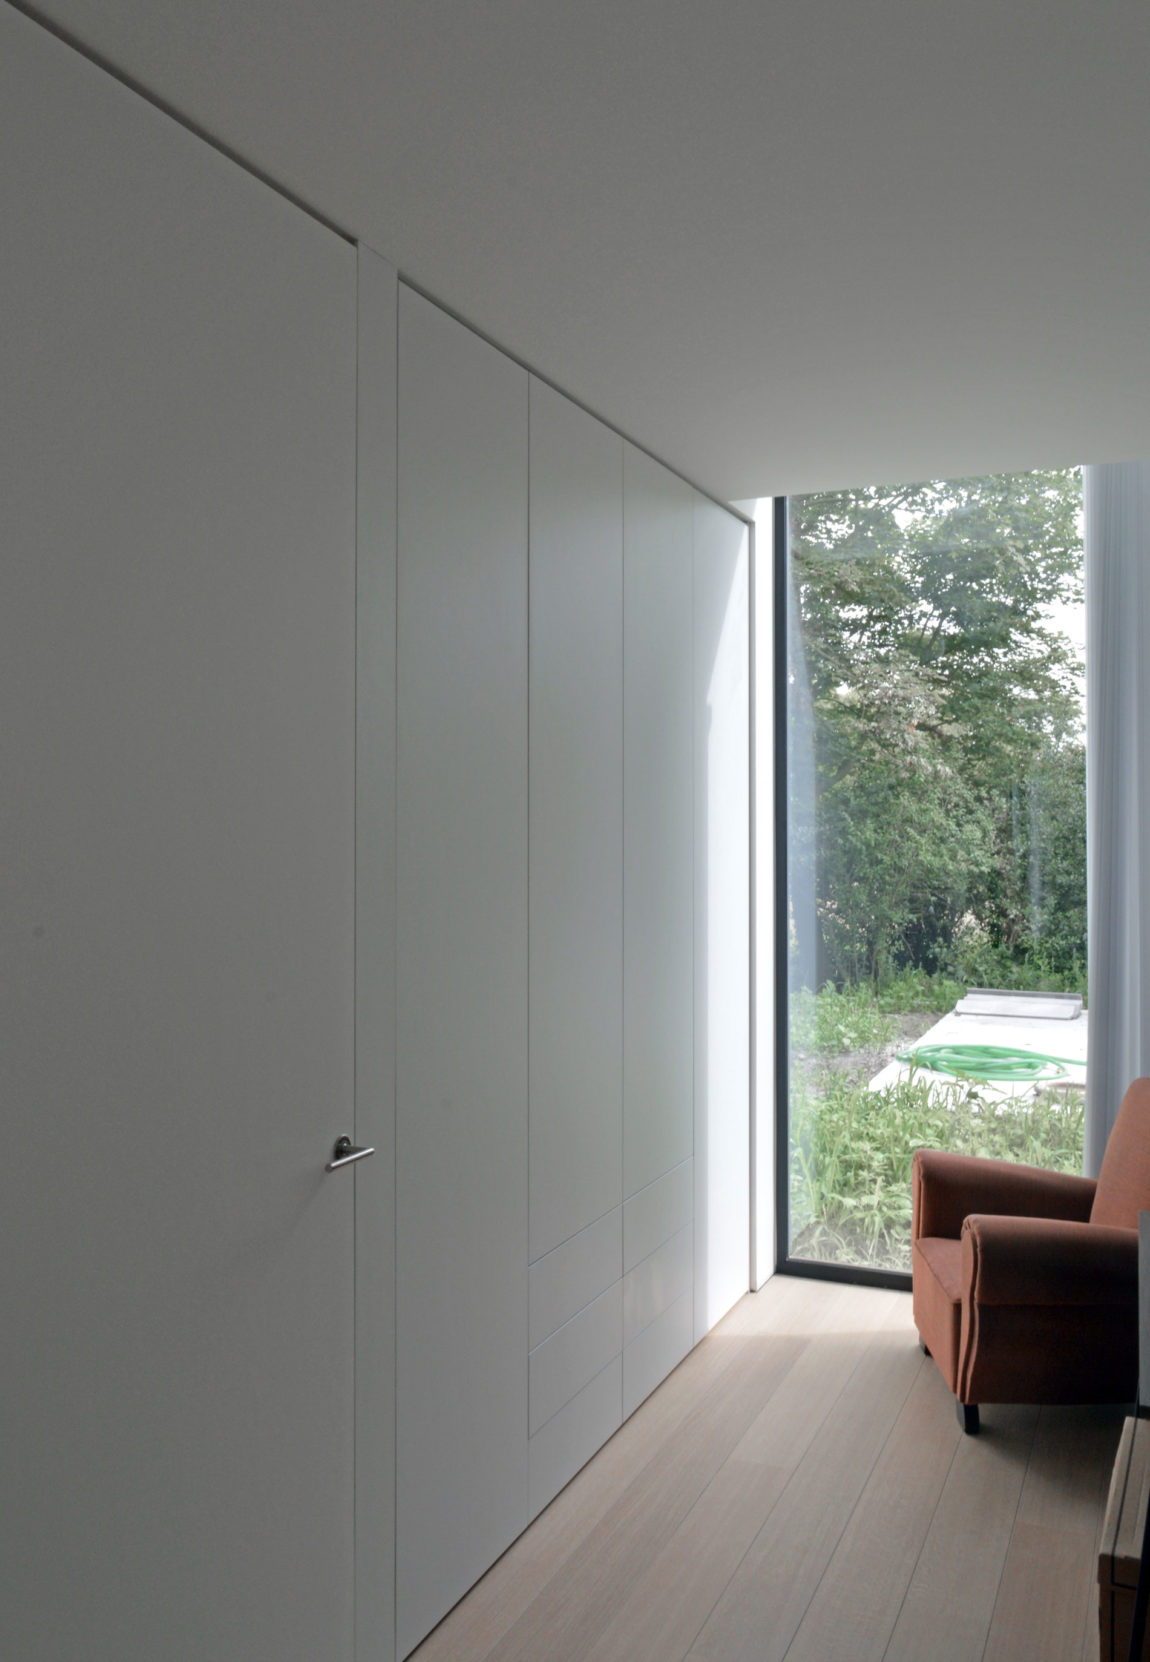 F&C Kiekens by Architektuurburo Dirk Hulpia (21)